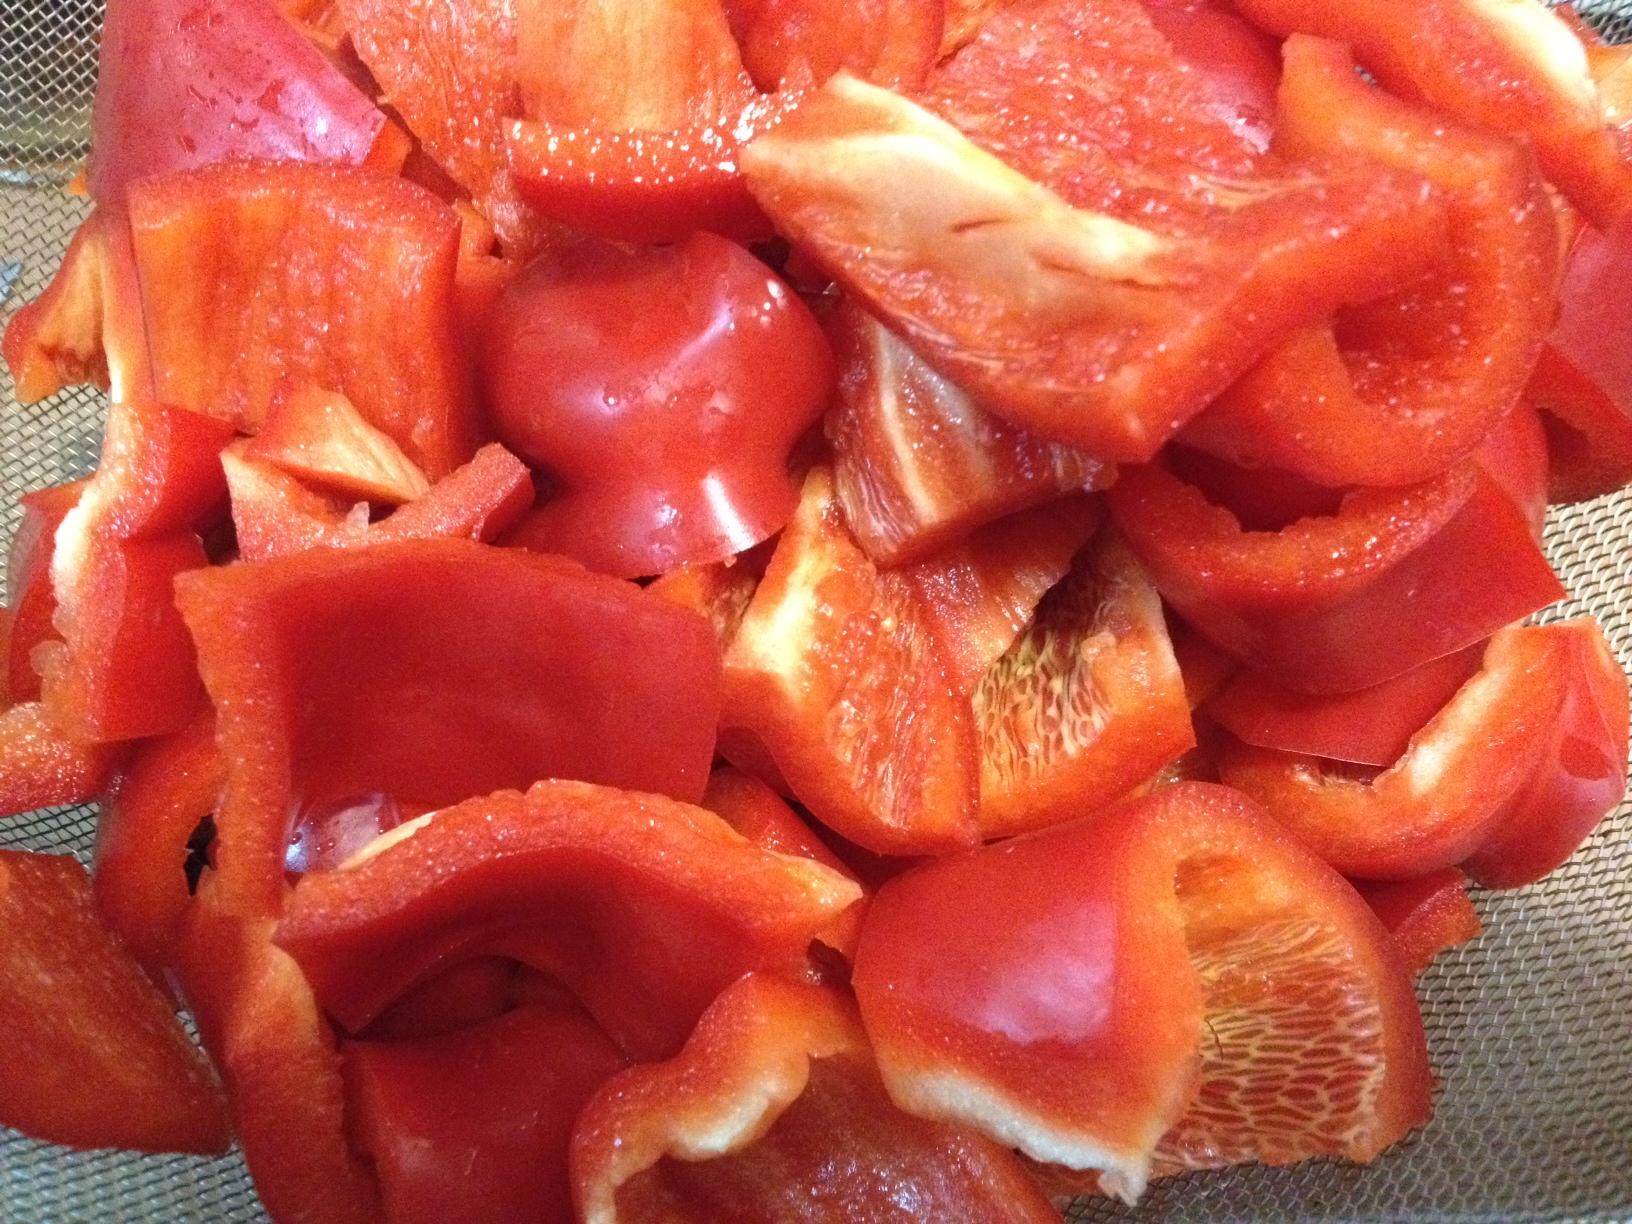 Receta de mermelada de pimientos casera gourmet like me - Como hacer mermelada de pimiento ...